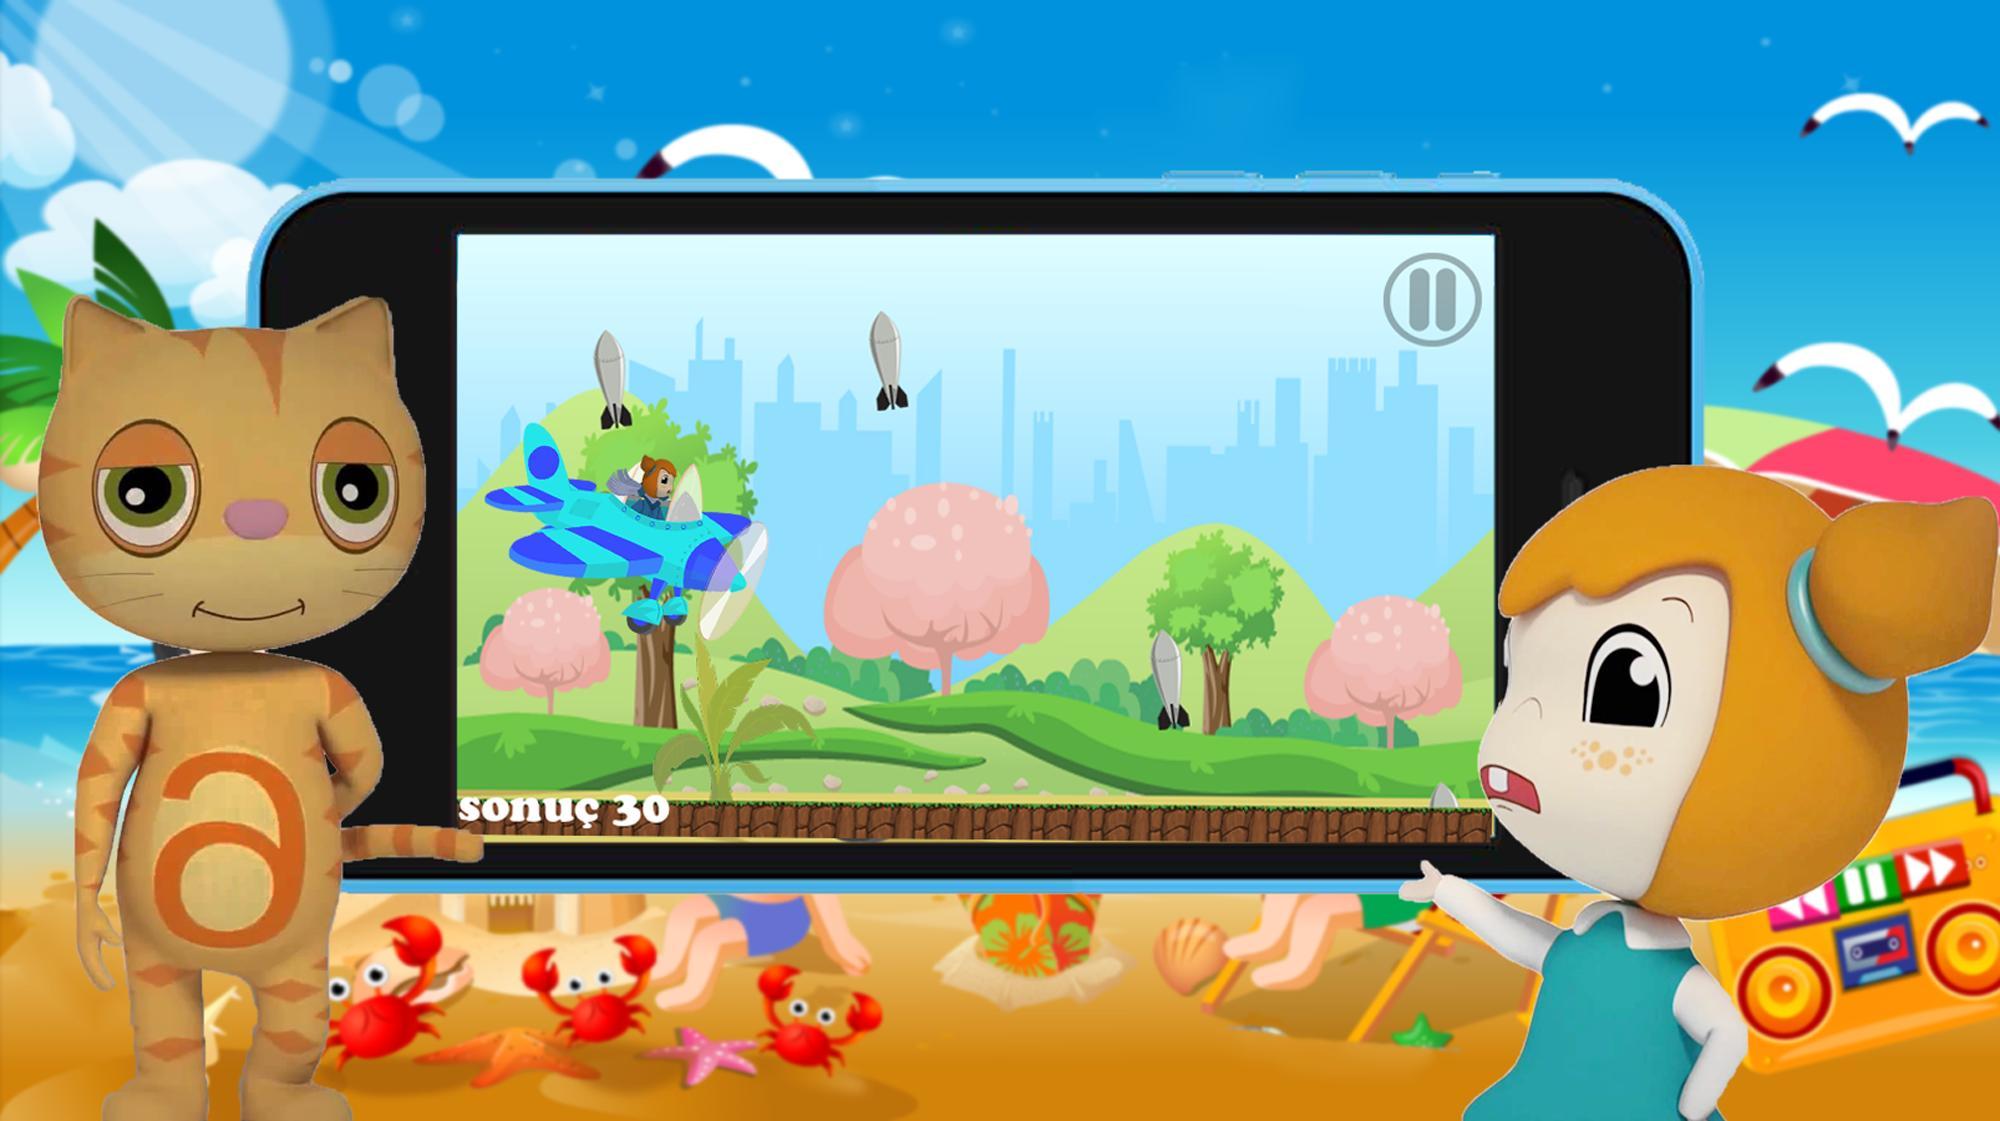 Canim Ve Ozi Kardesim Cocuk Macera Oyunu Fur Android Apk